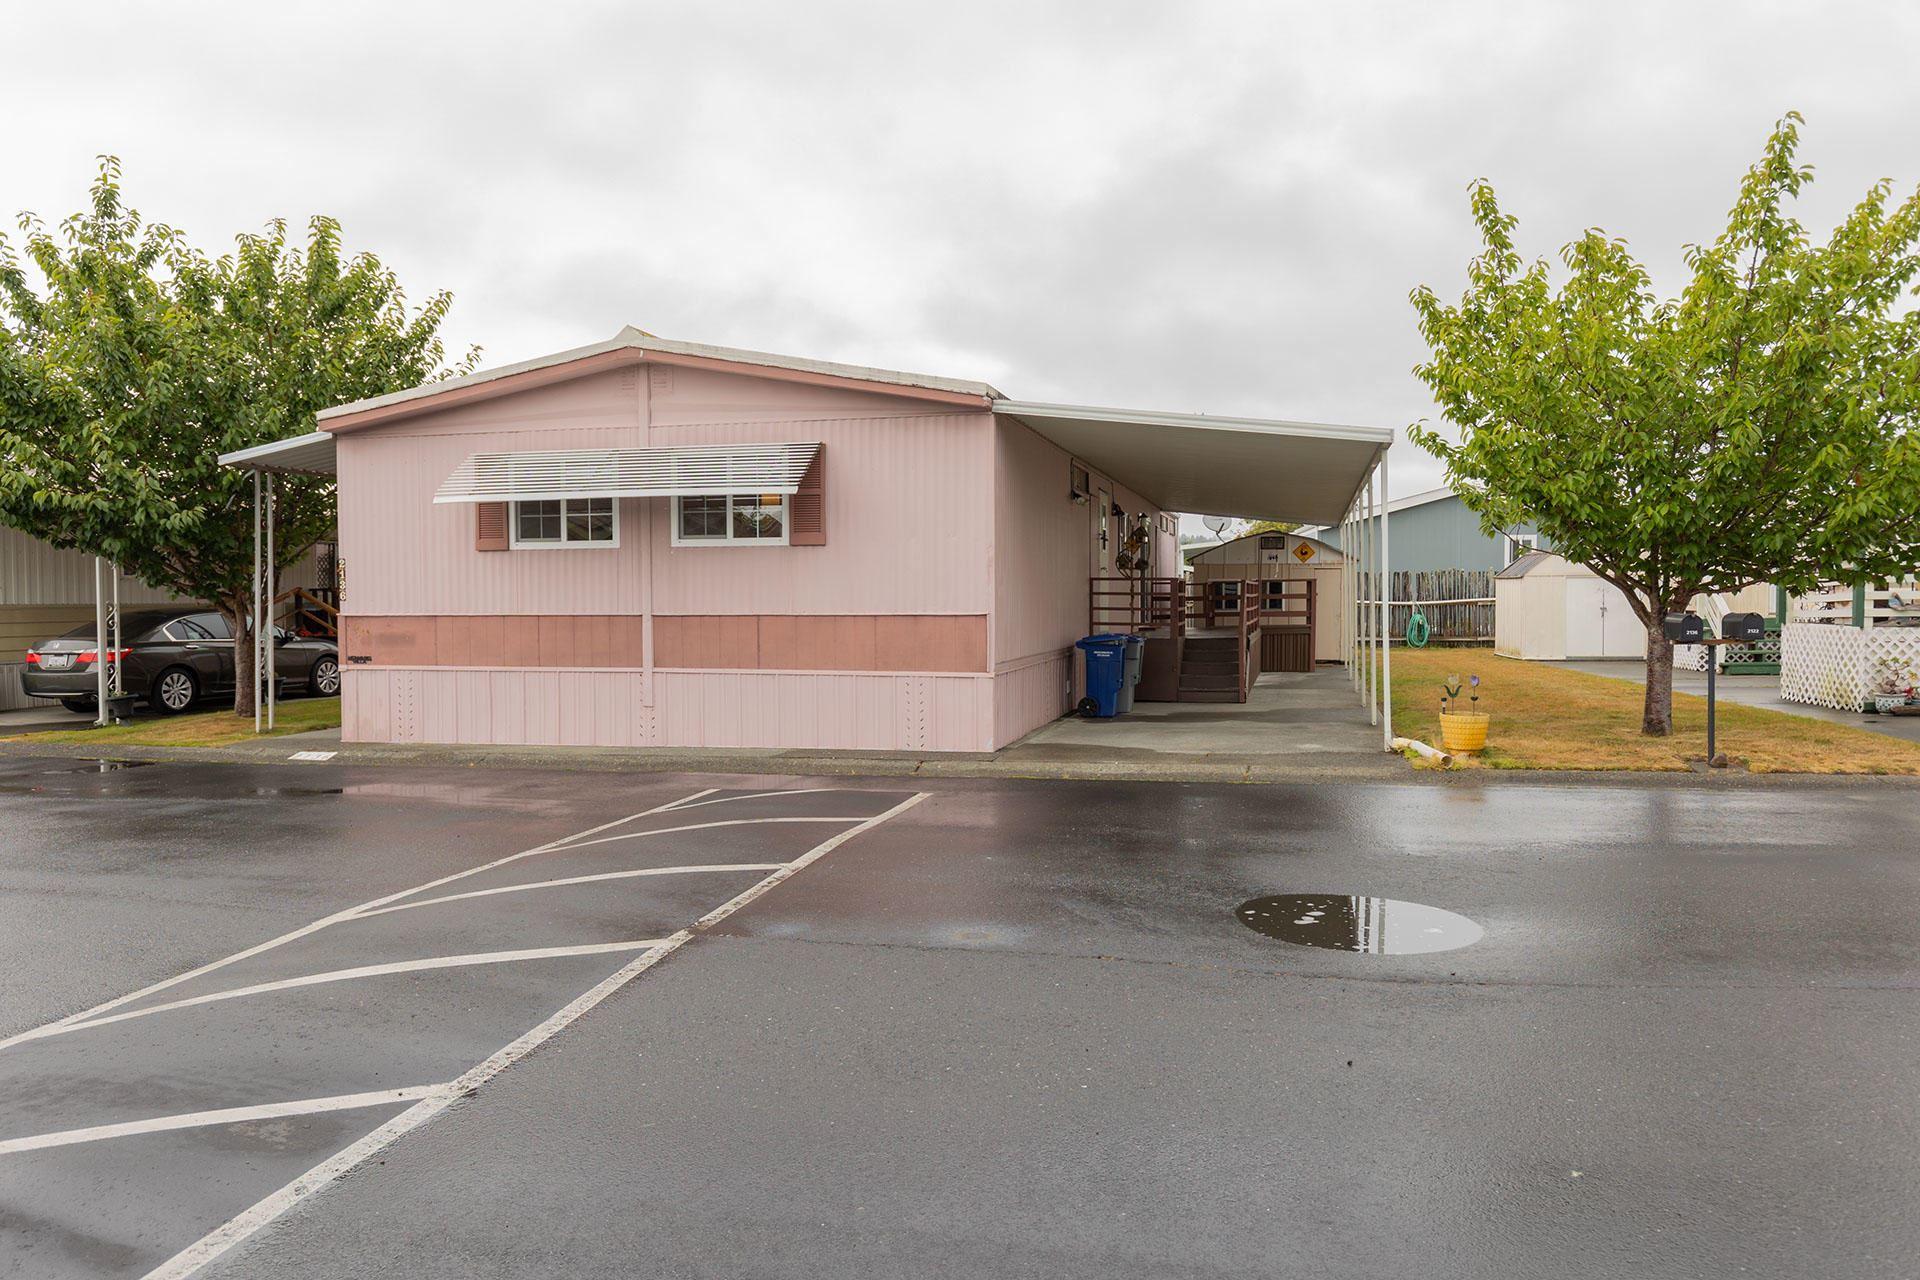 2136 Appaloosa Lane, Arcata, CA 95521 - MLS#: 259704